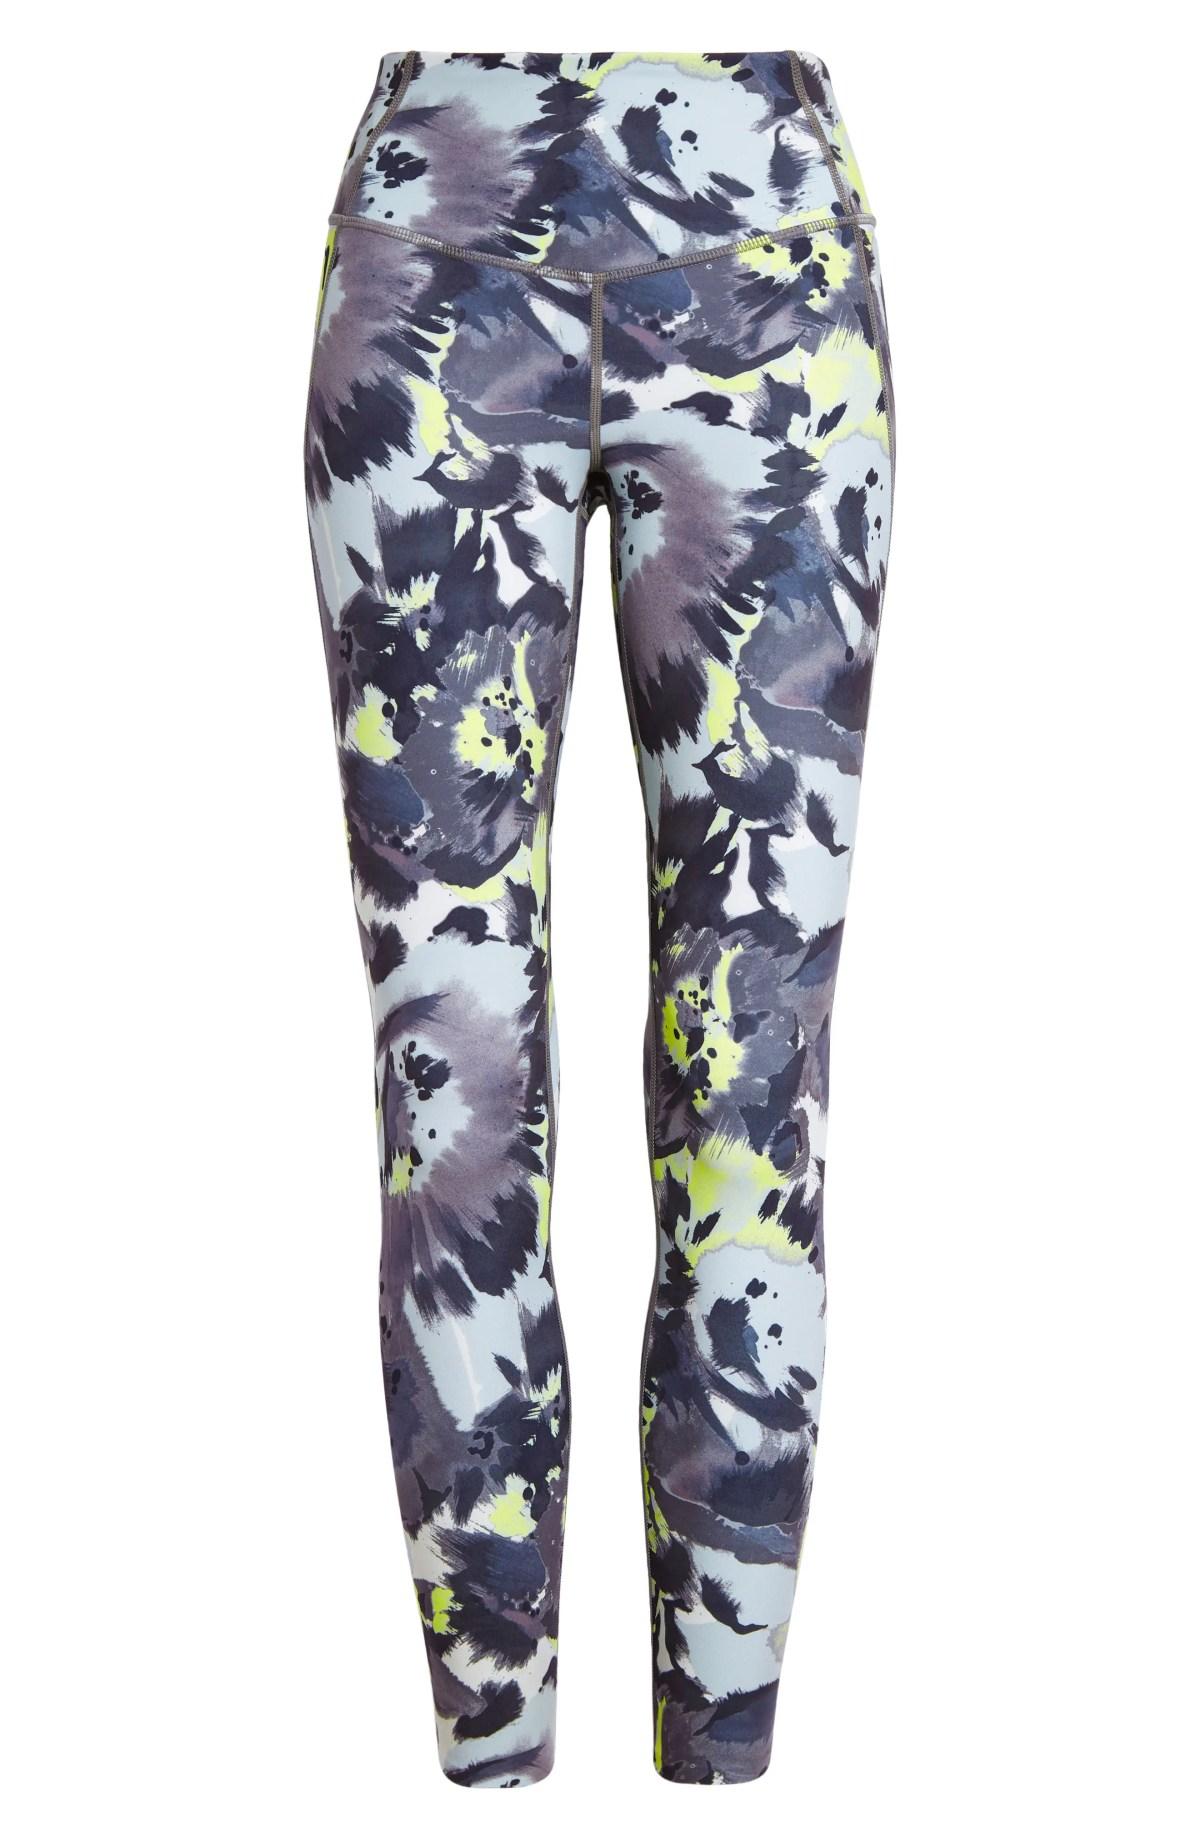 ZELLA Studio Lite High Waist Pocket 7/8 Leggings, Main, color, GREY SHADE TIE DYE BLOOMS